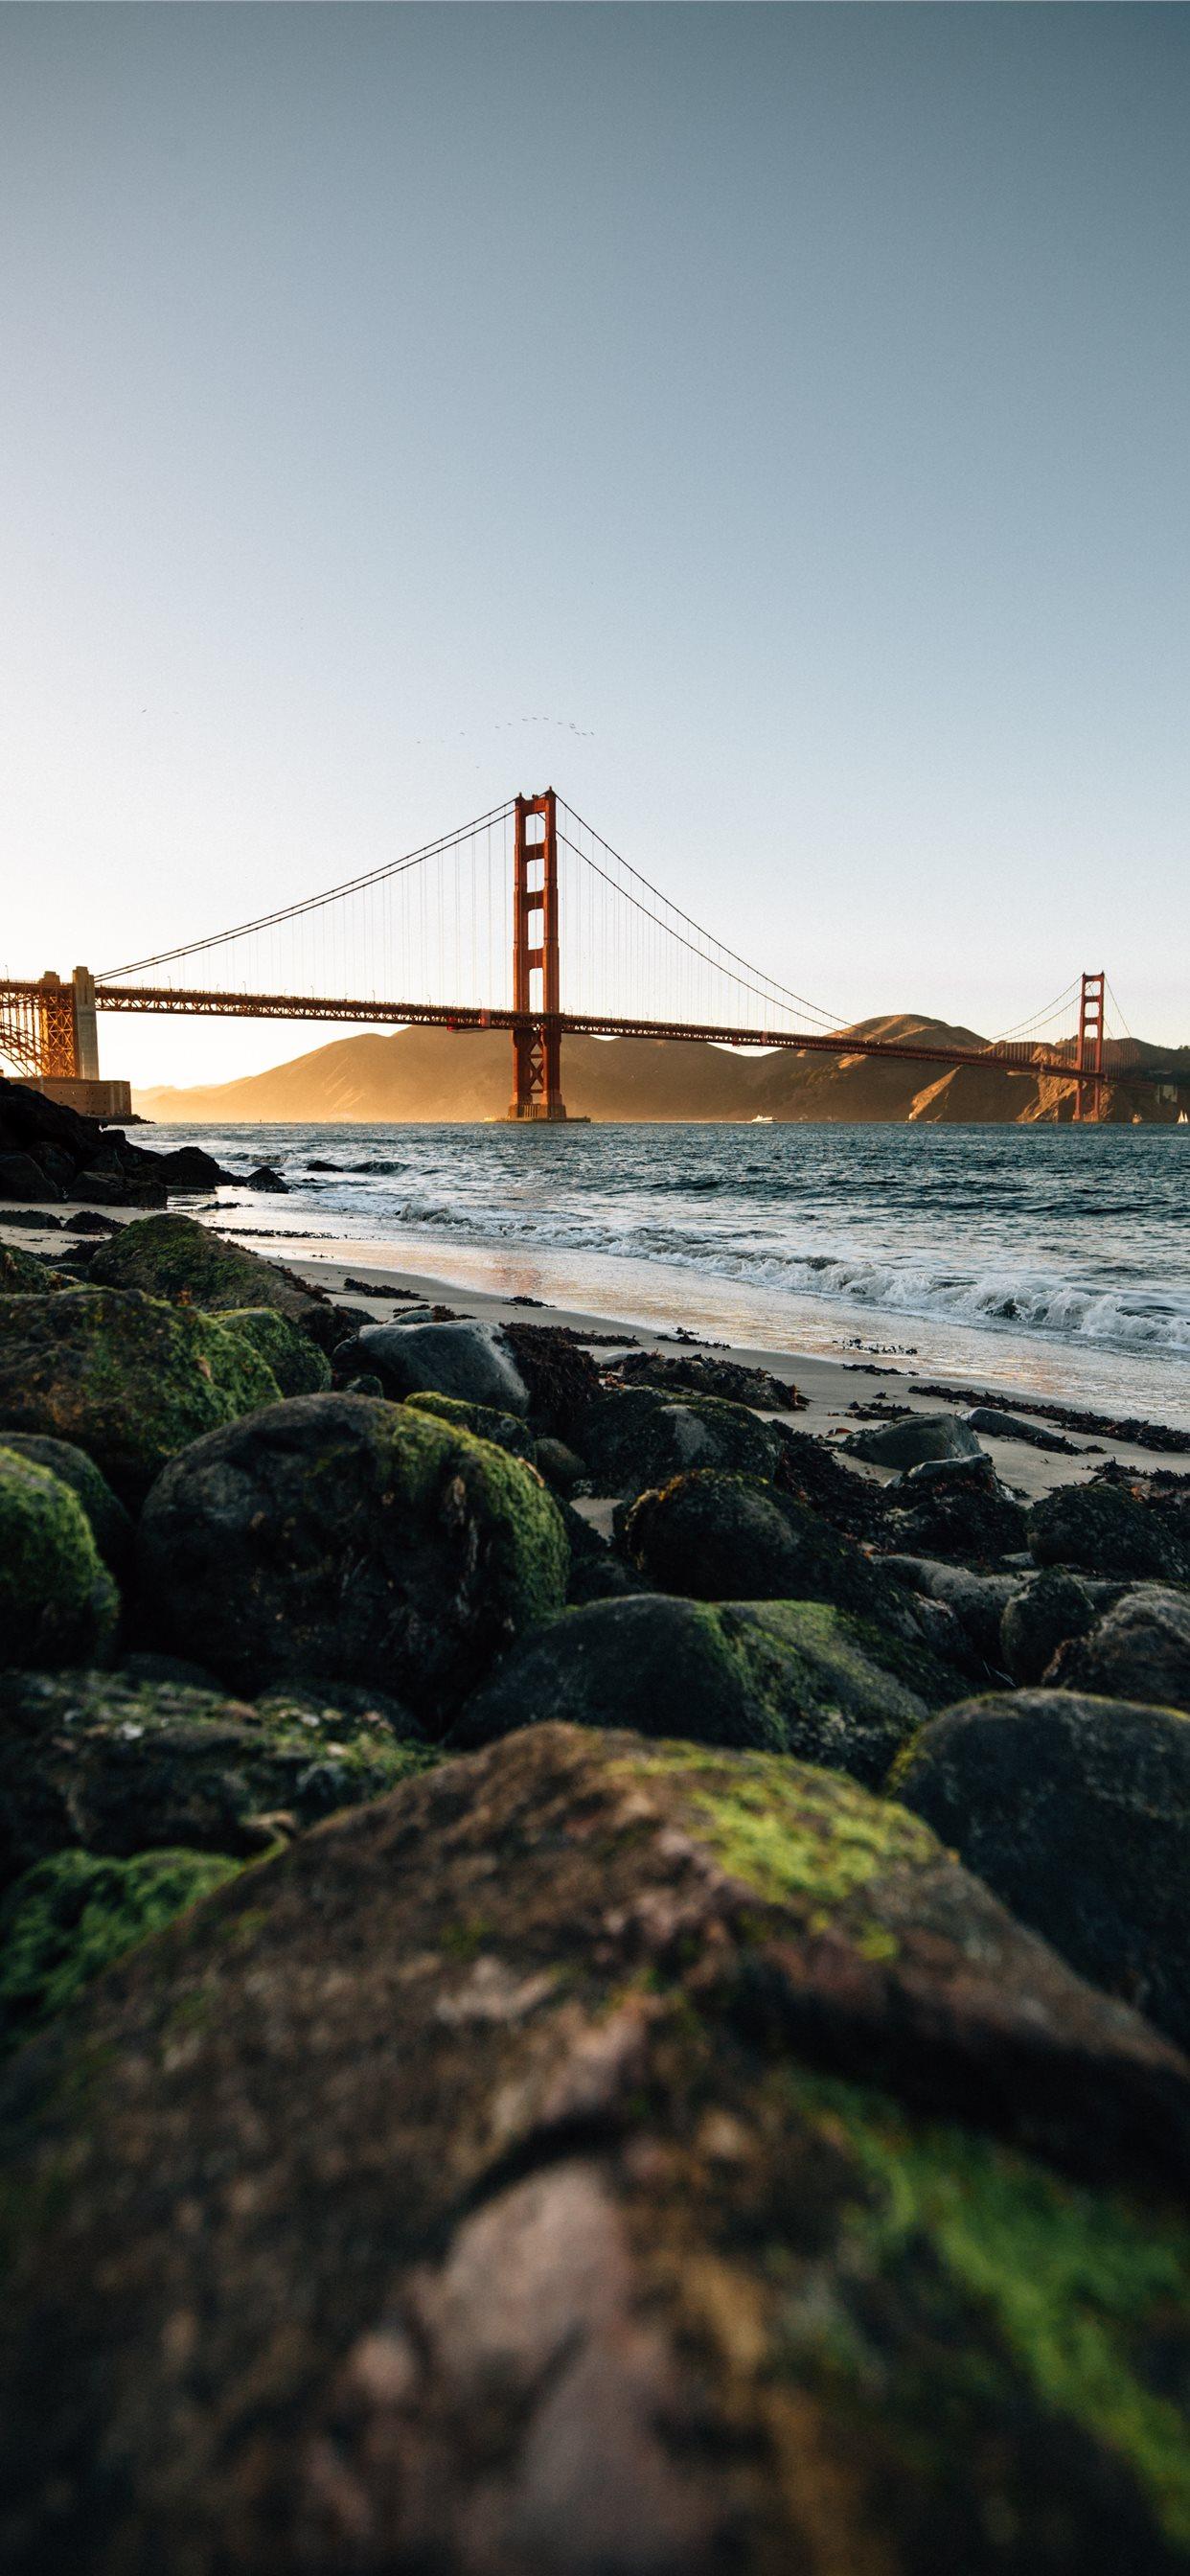 Golden Gate Bridge San Francisco At Daytime Iphone 11 Wallpapers Free Download